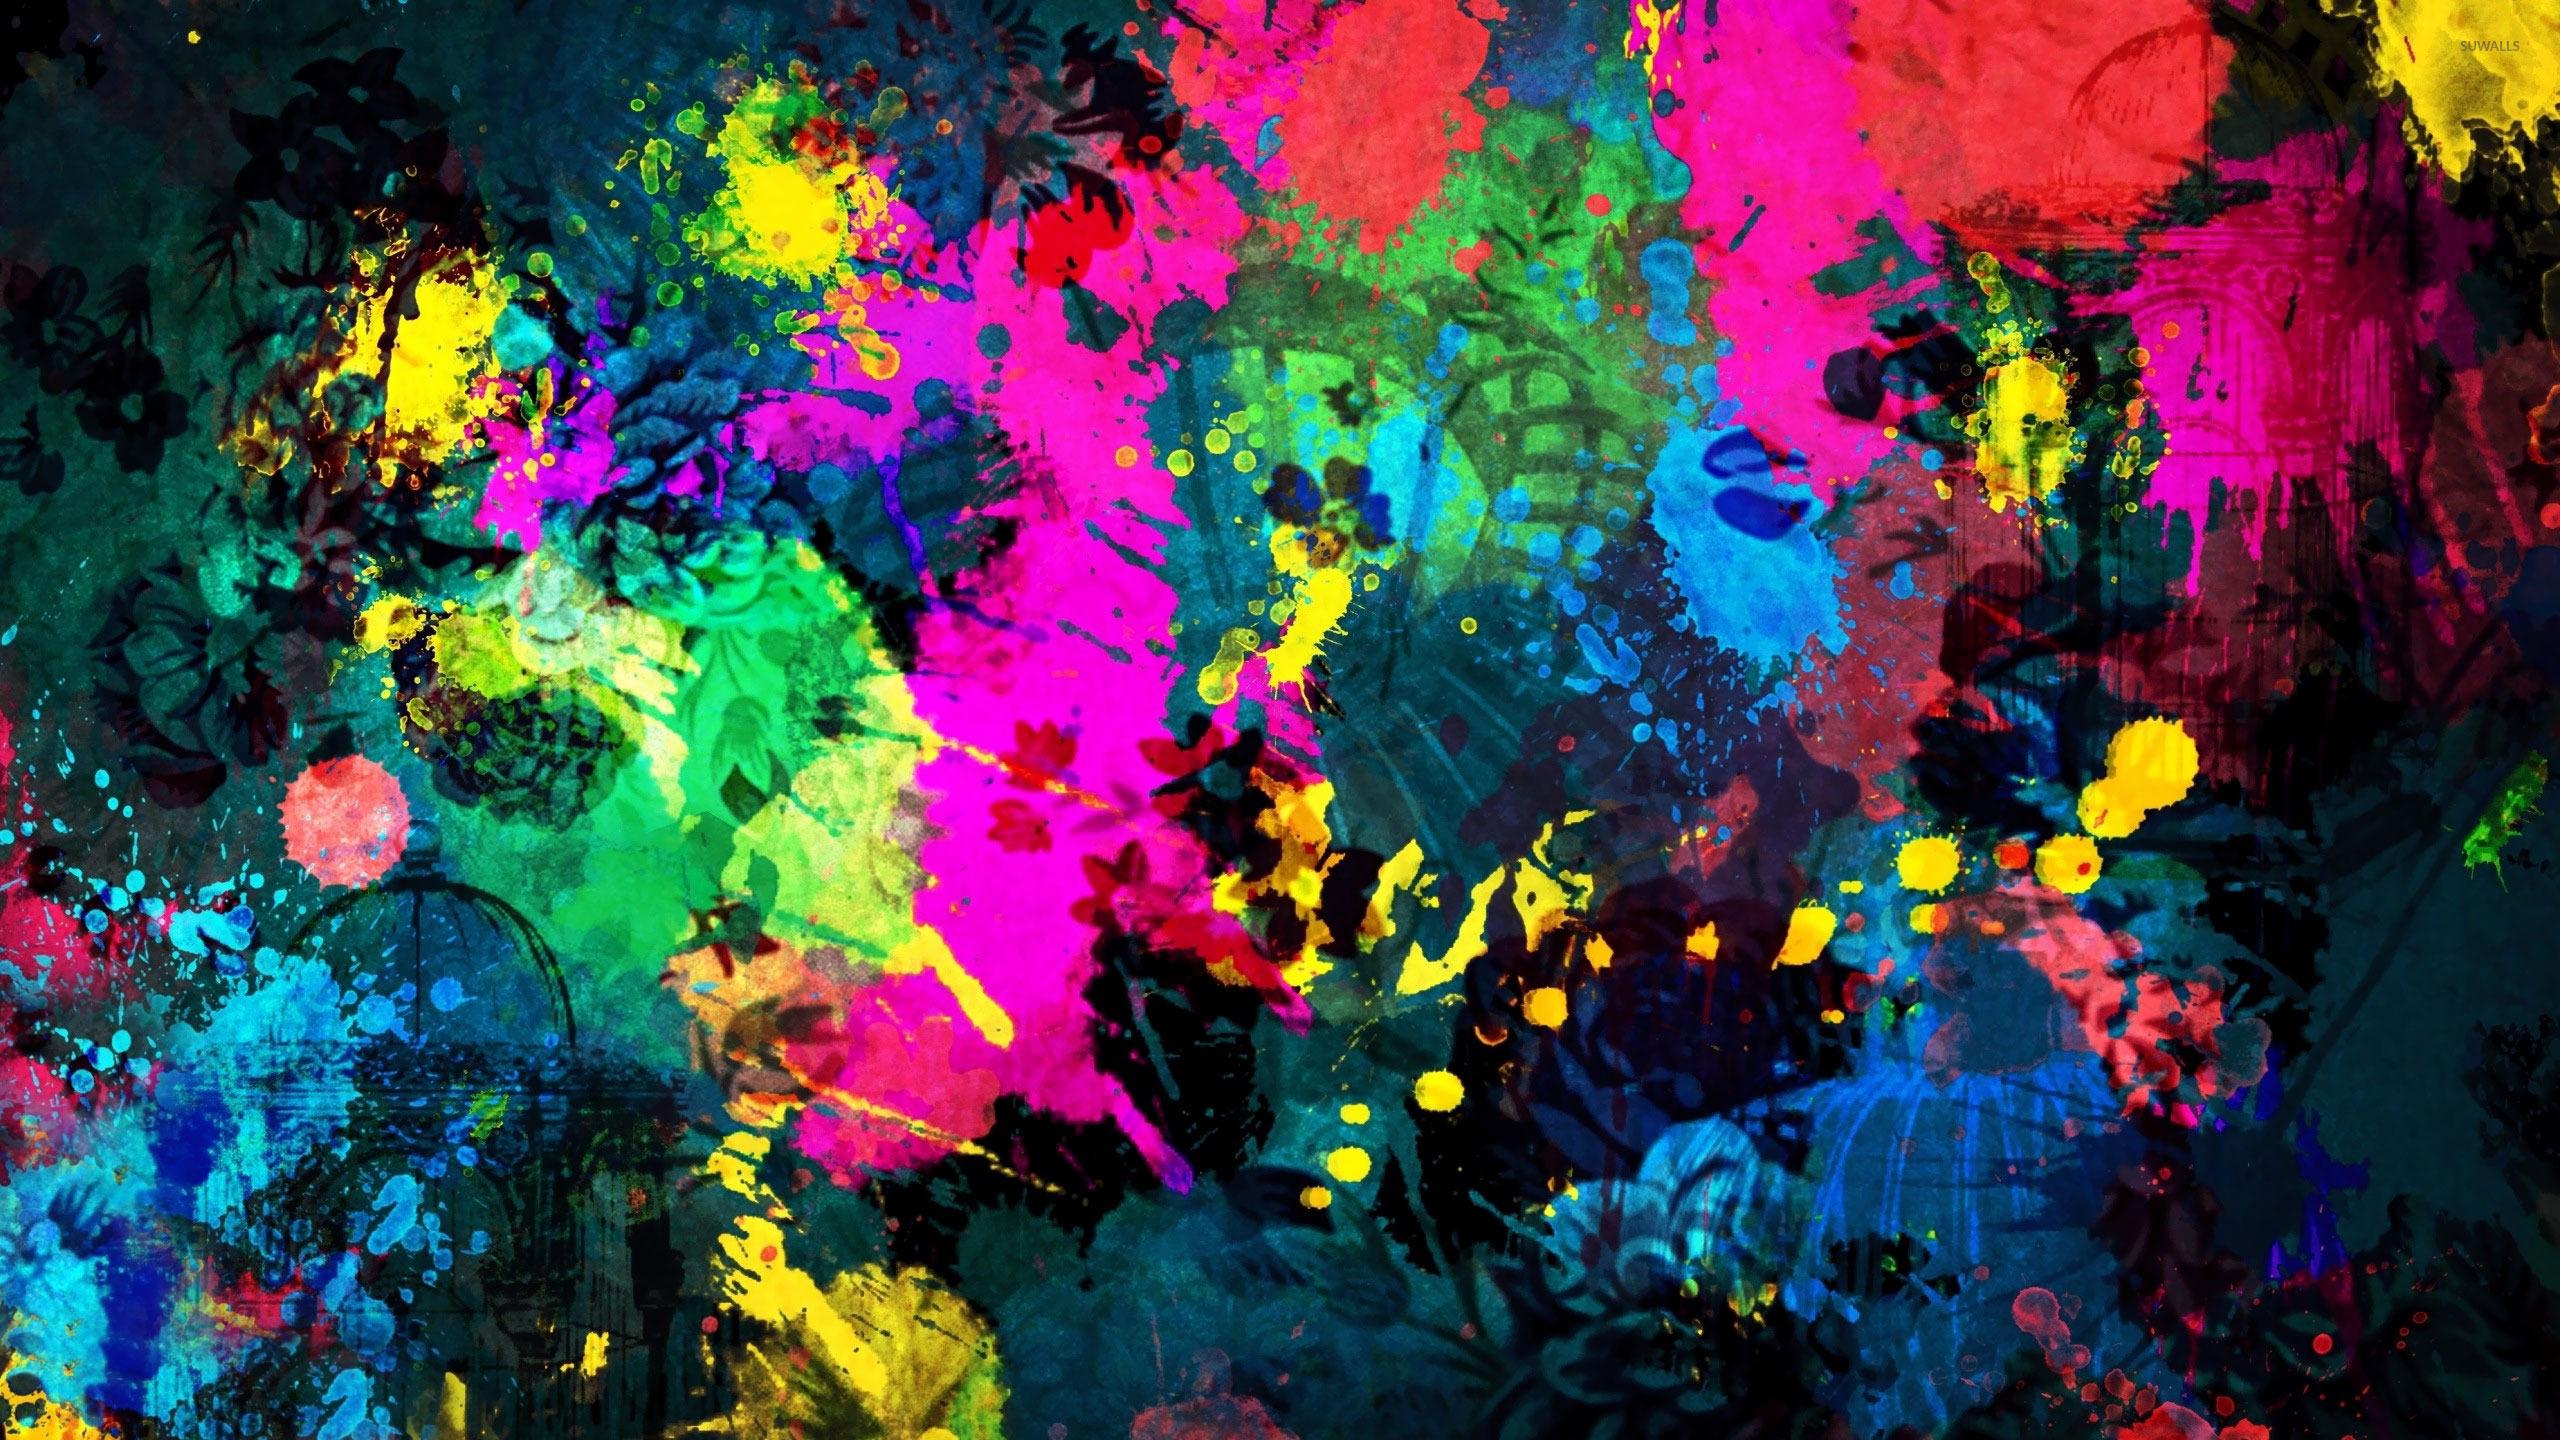 Colorful Paint Splatter Wallpaper